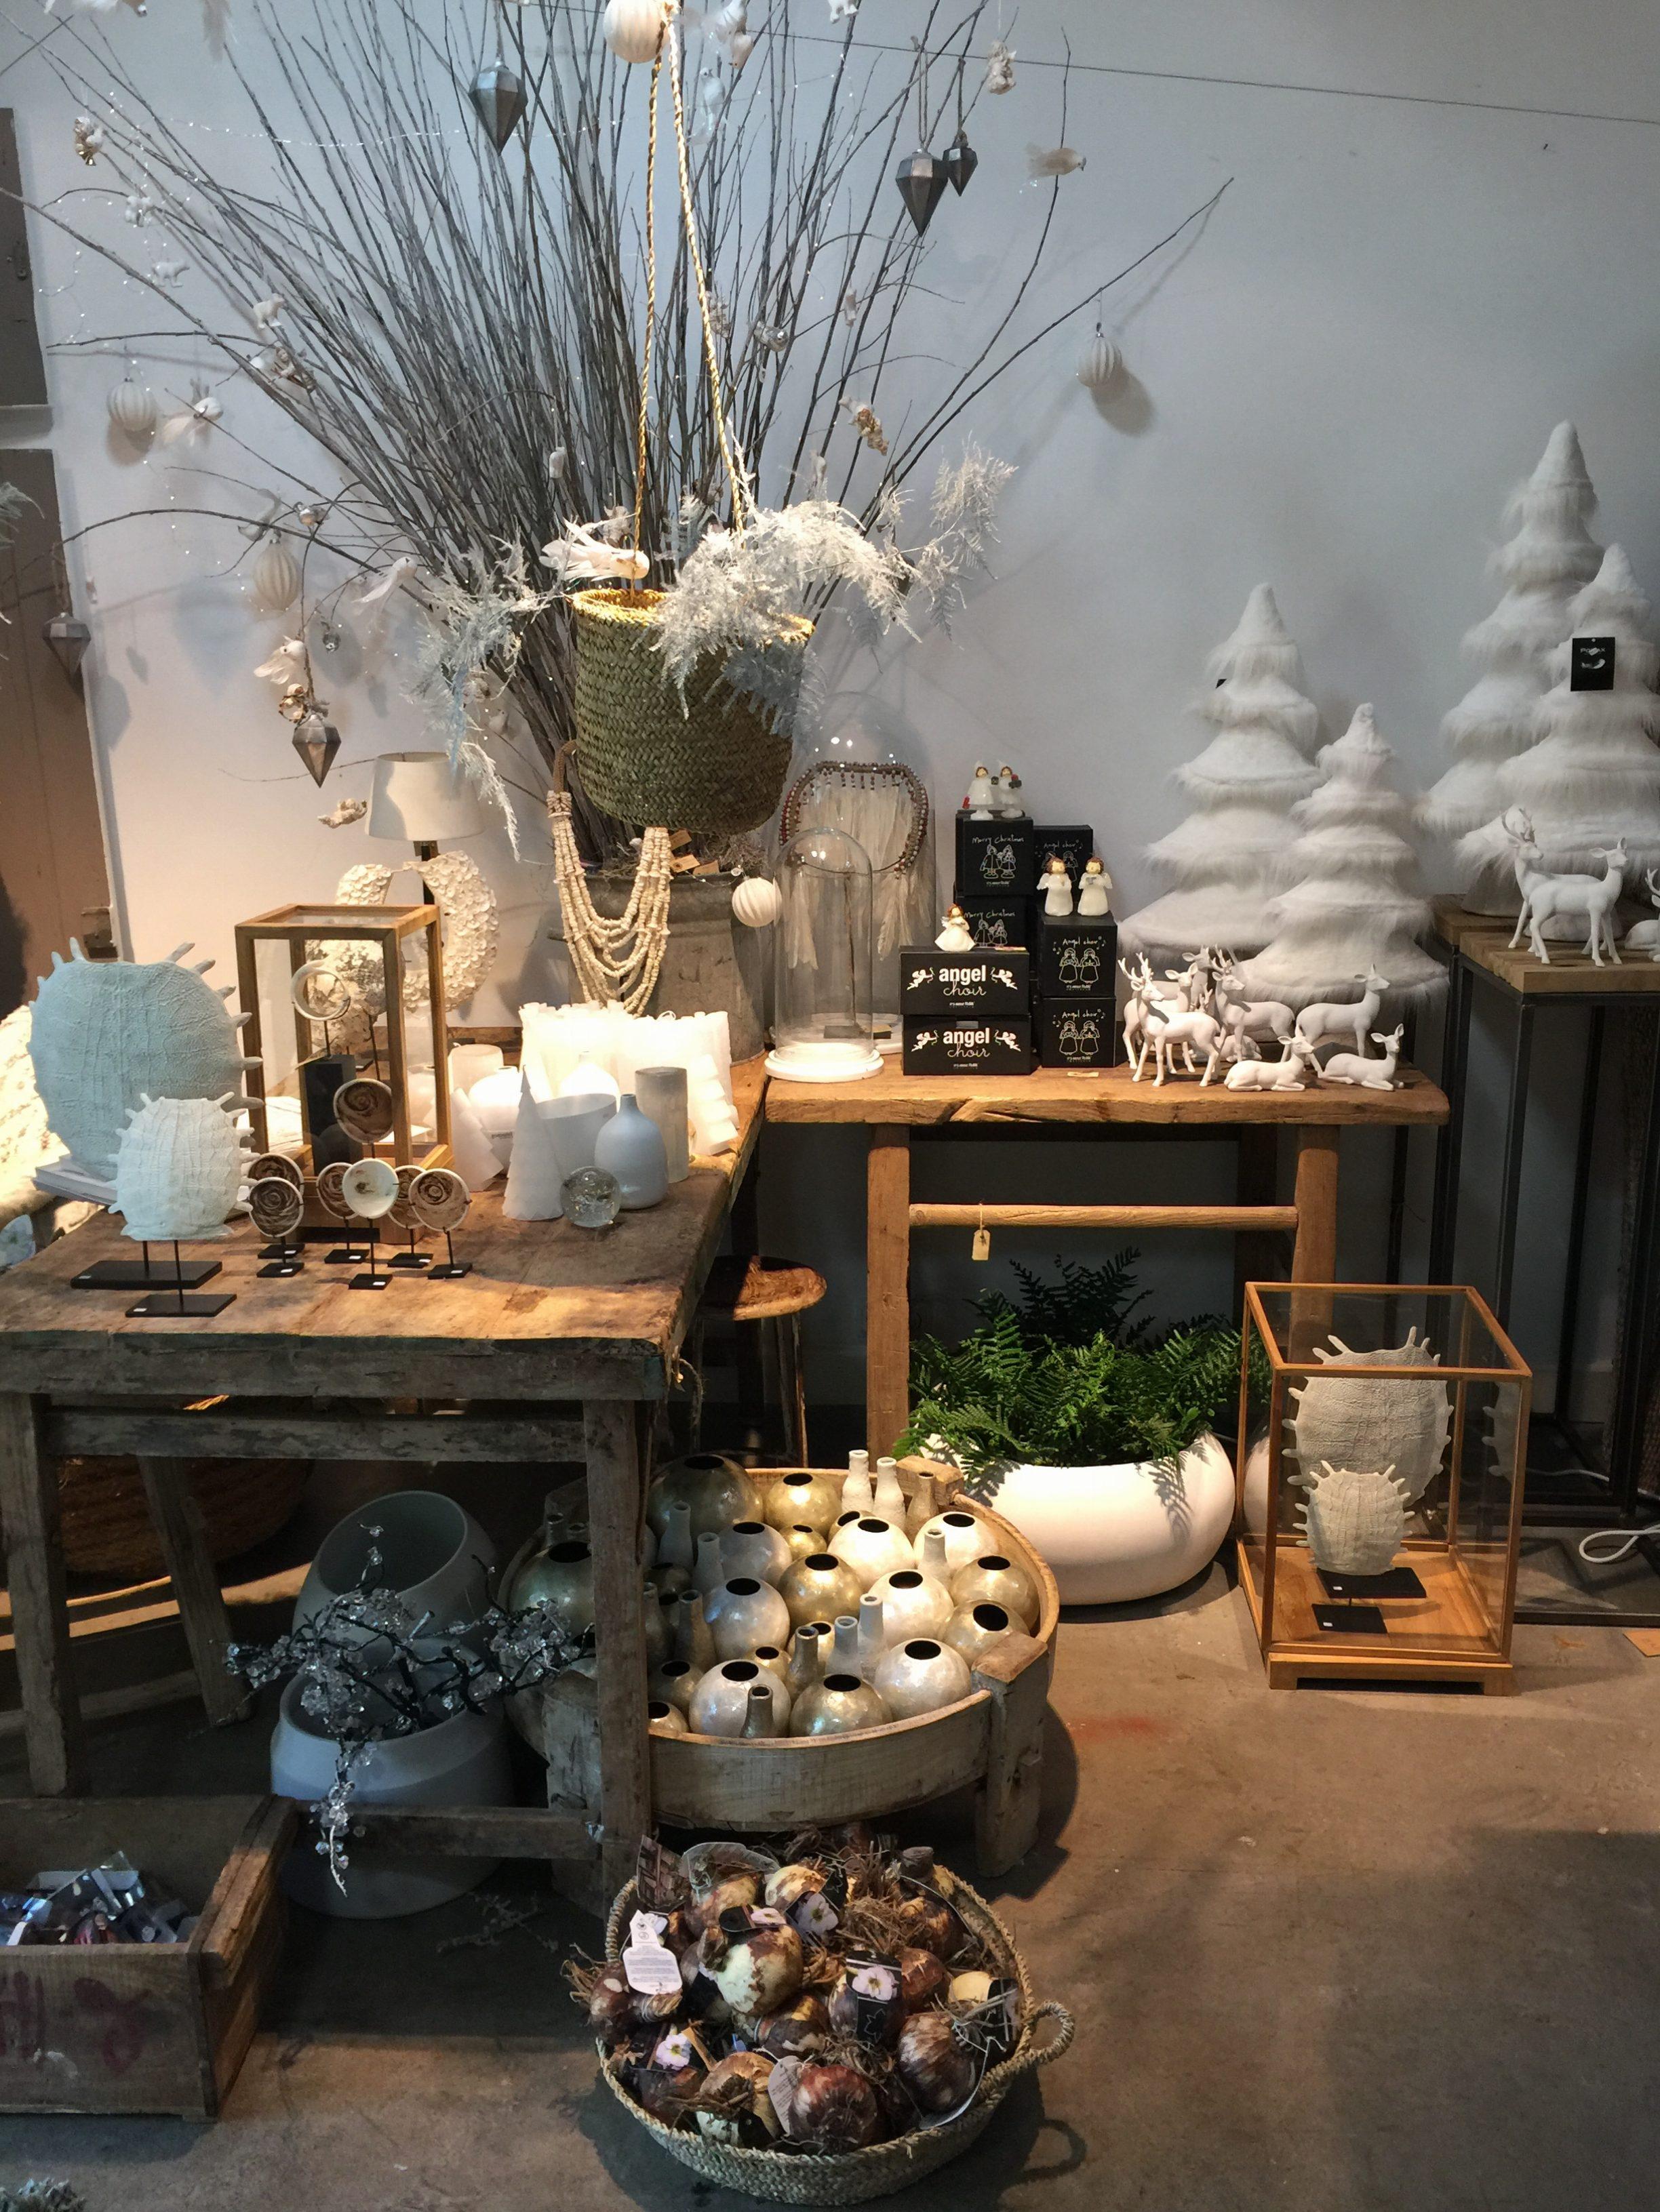 Kerst bij moss ginnekenweg online breda for Interieur winkels